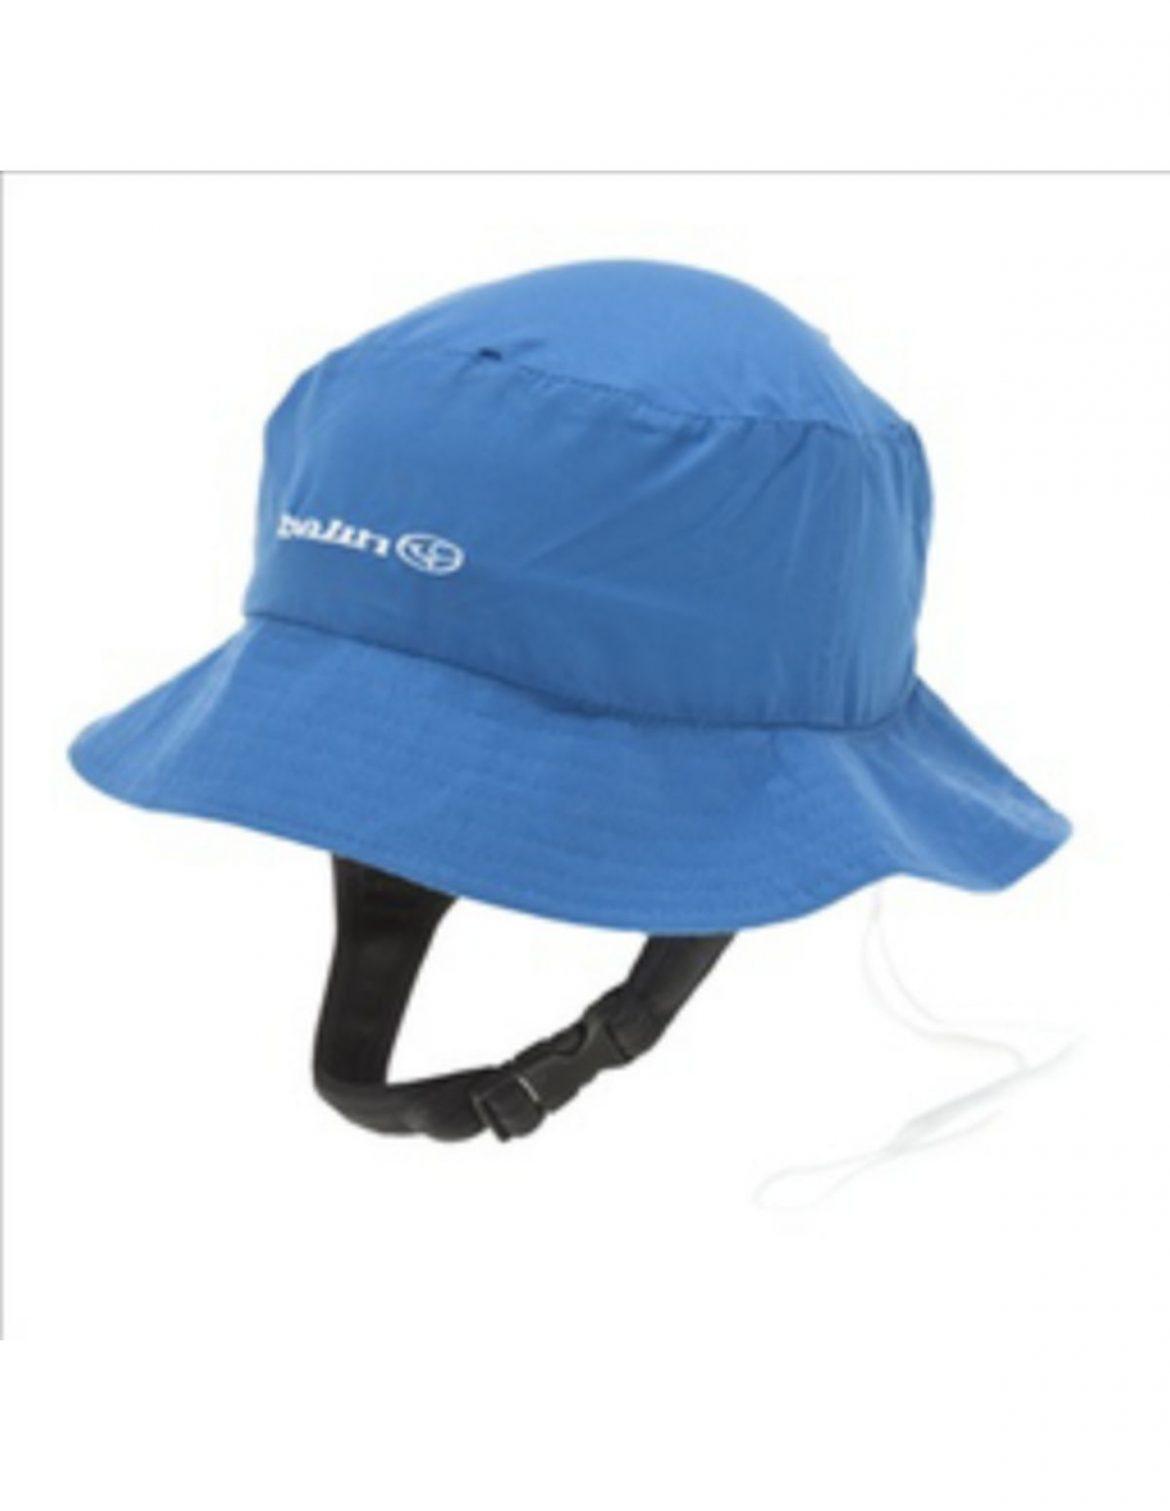 Balin Surf Hat